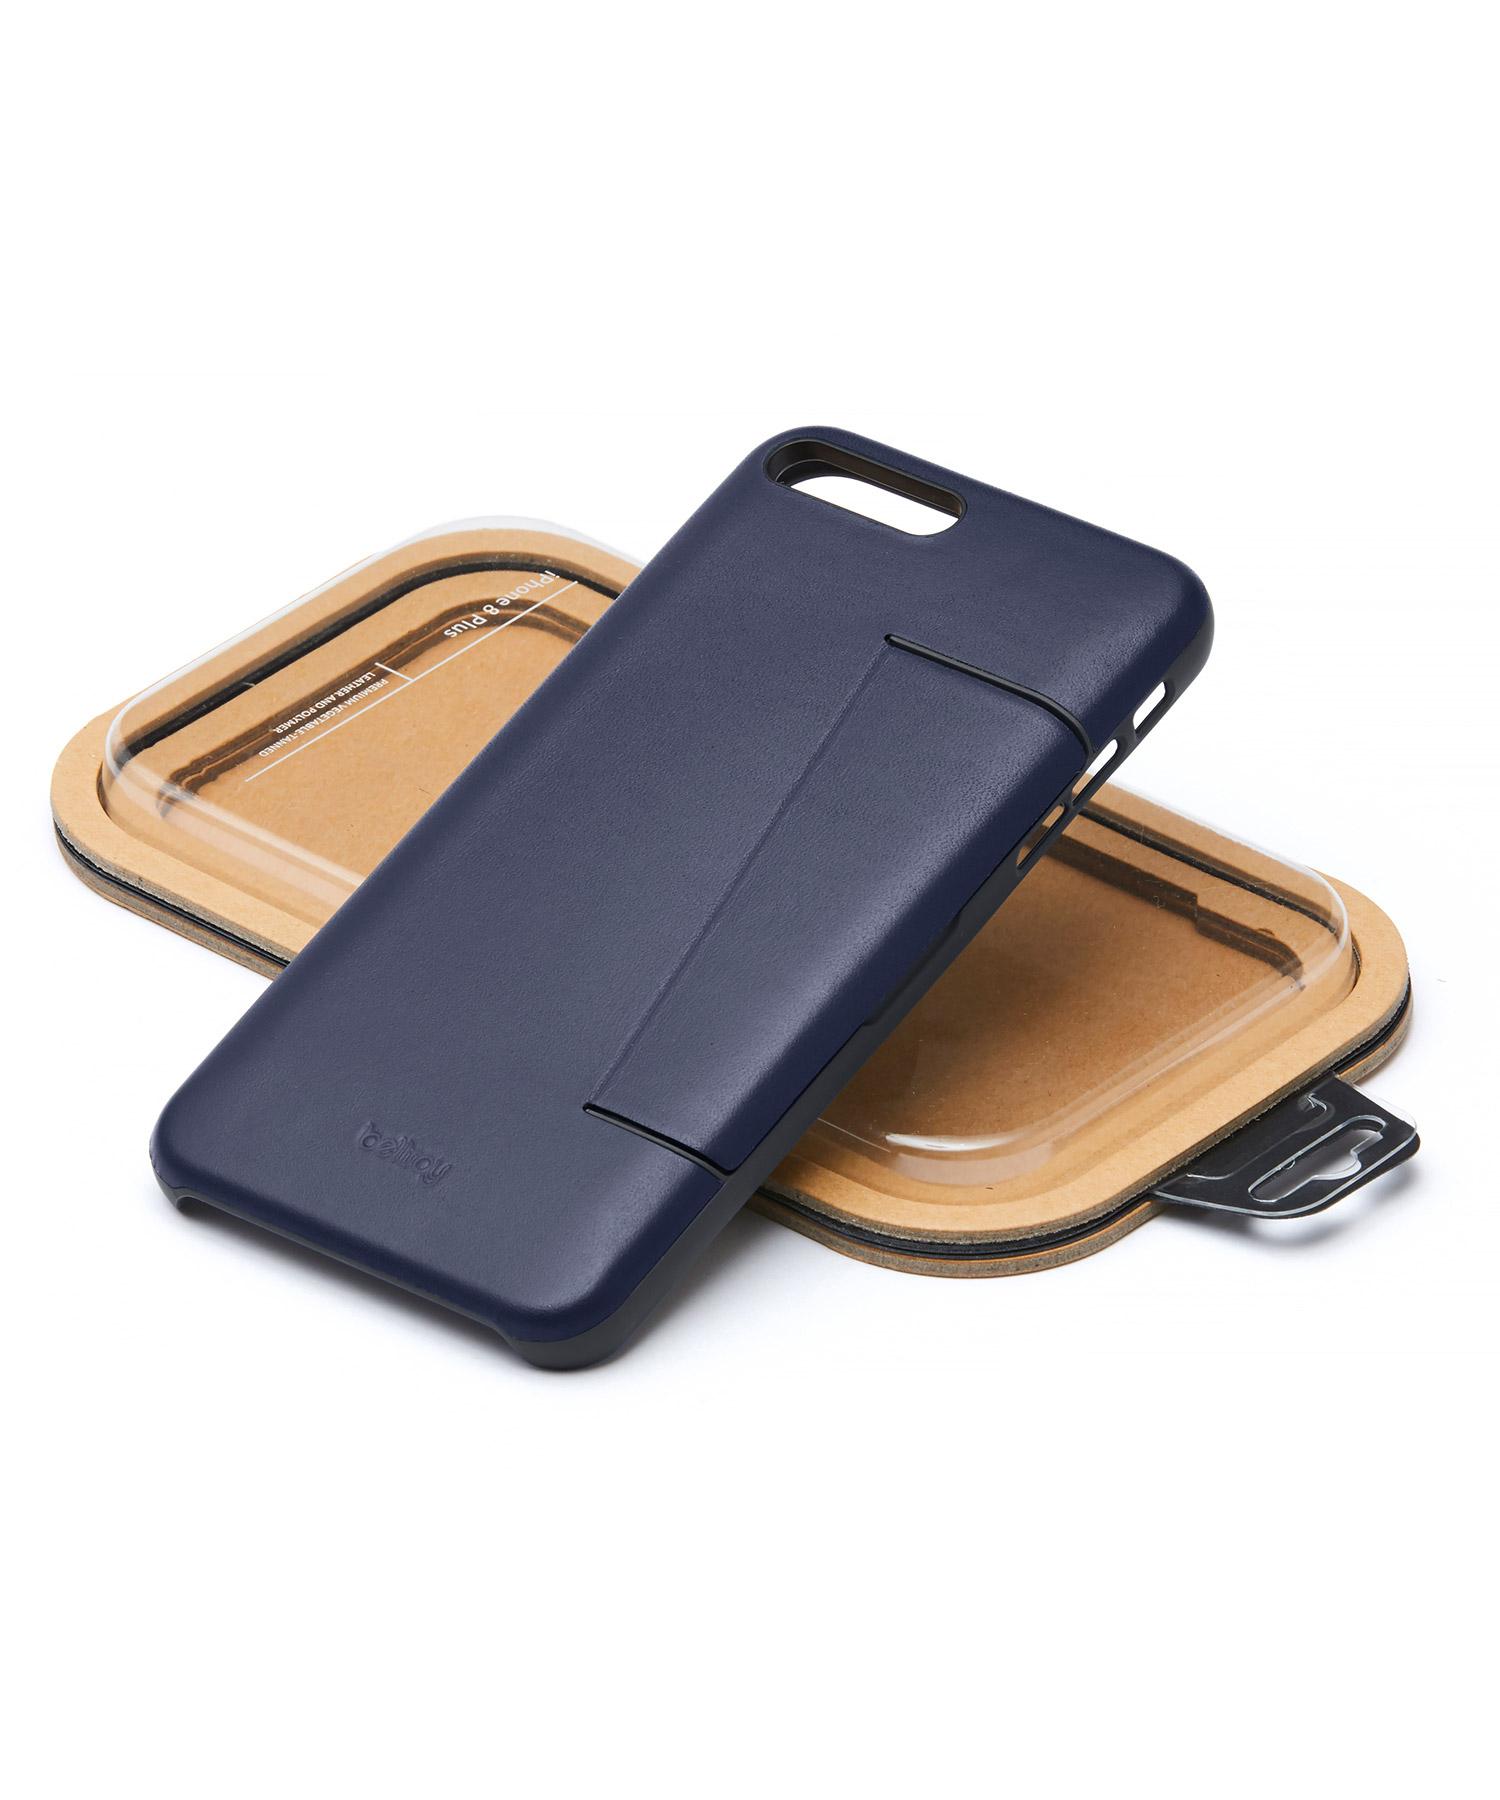 Bellroy Phone Case - 3 card <iPhone 7Plus/8Plus>